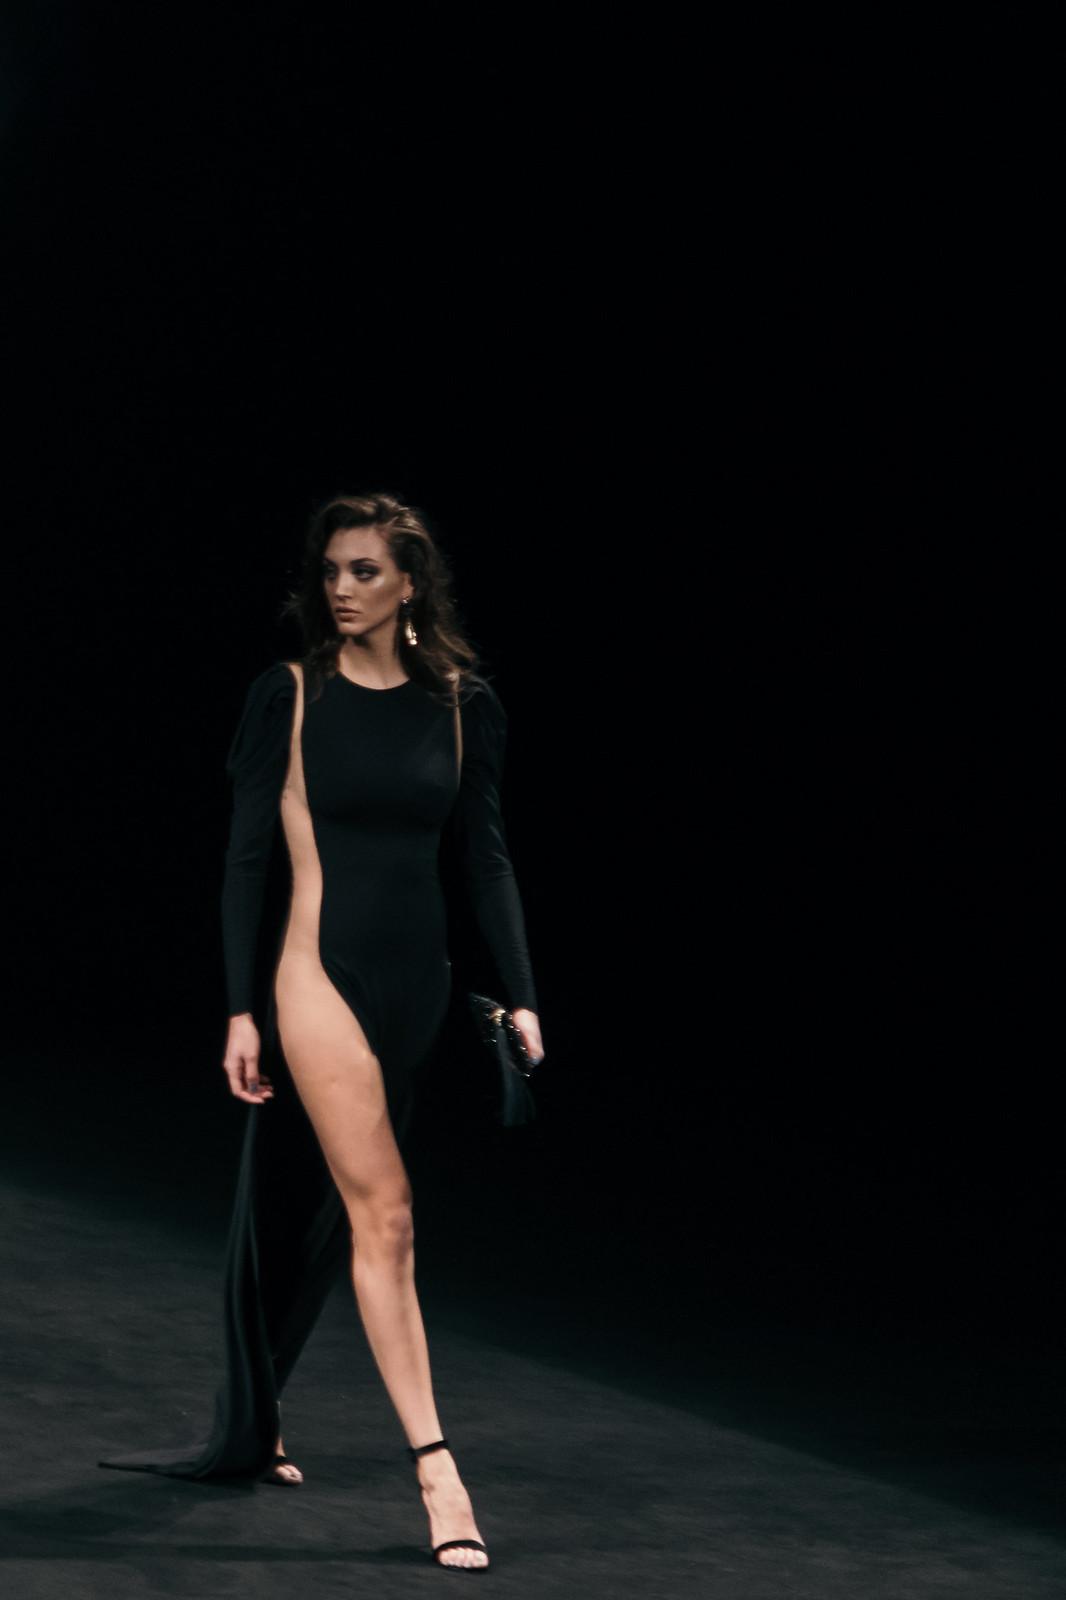 Jessie Chanes - Seams for a desire - 080 Bacelona Fashion #080bcnfasion -62